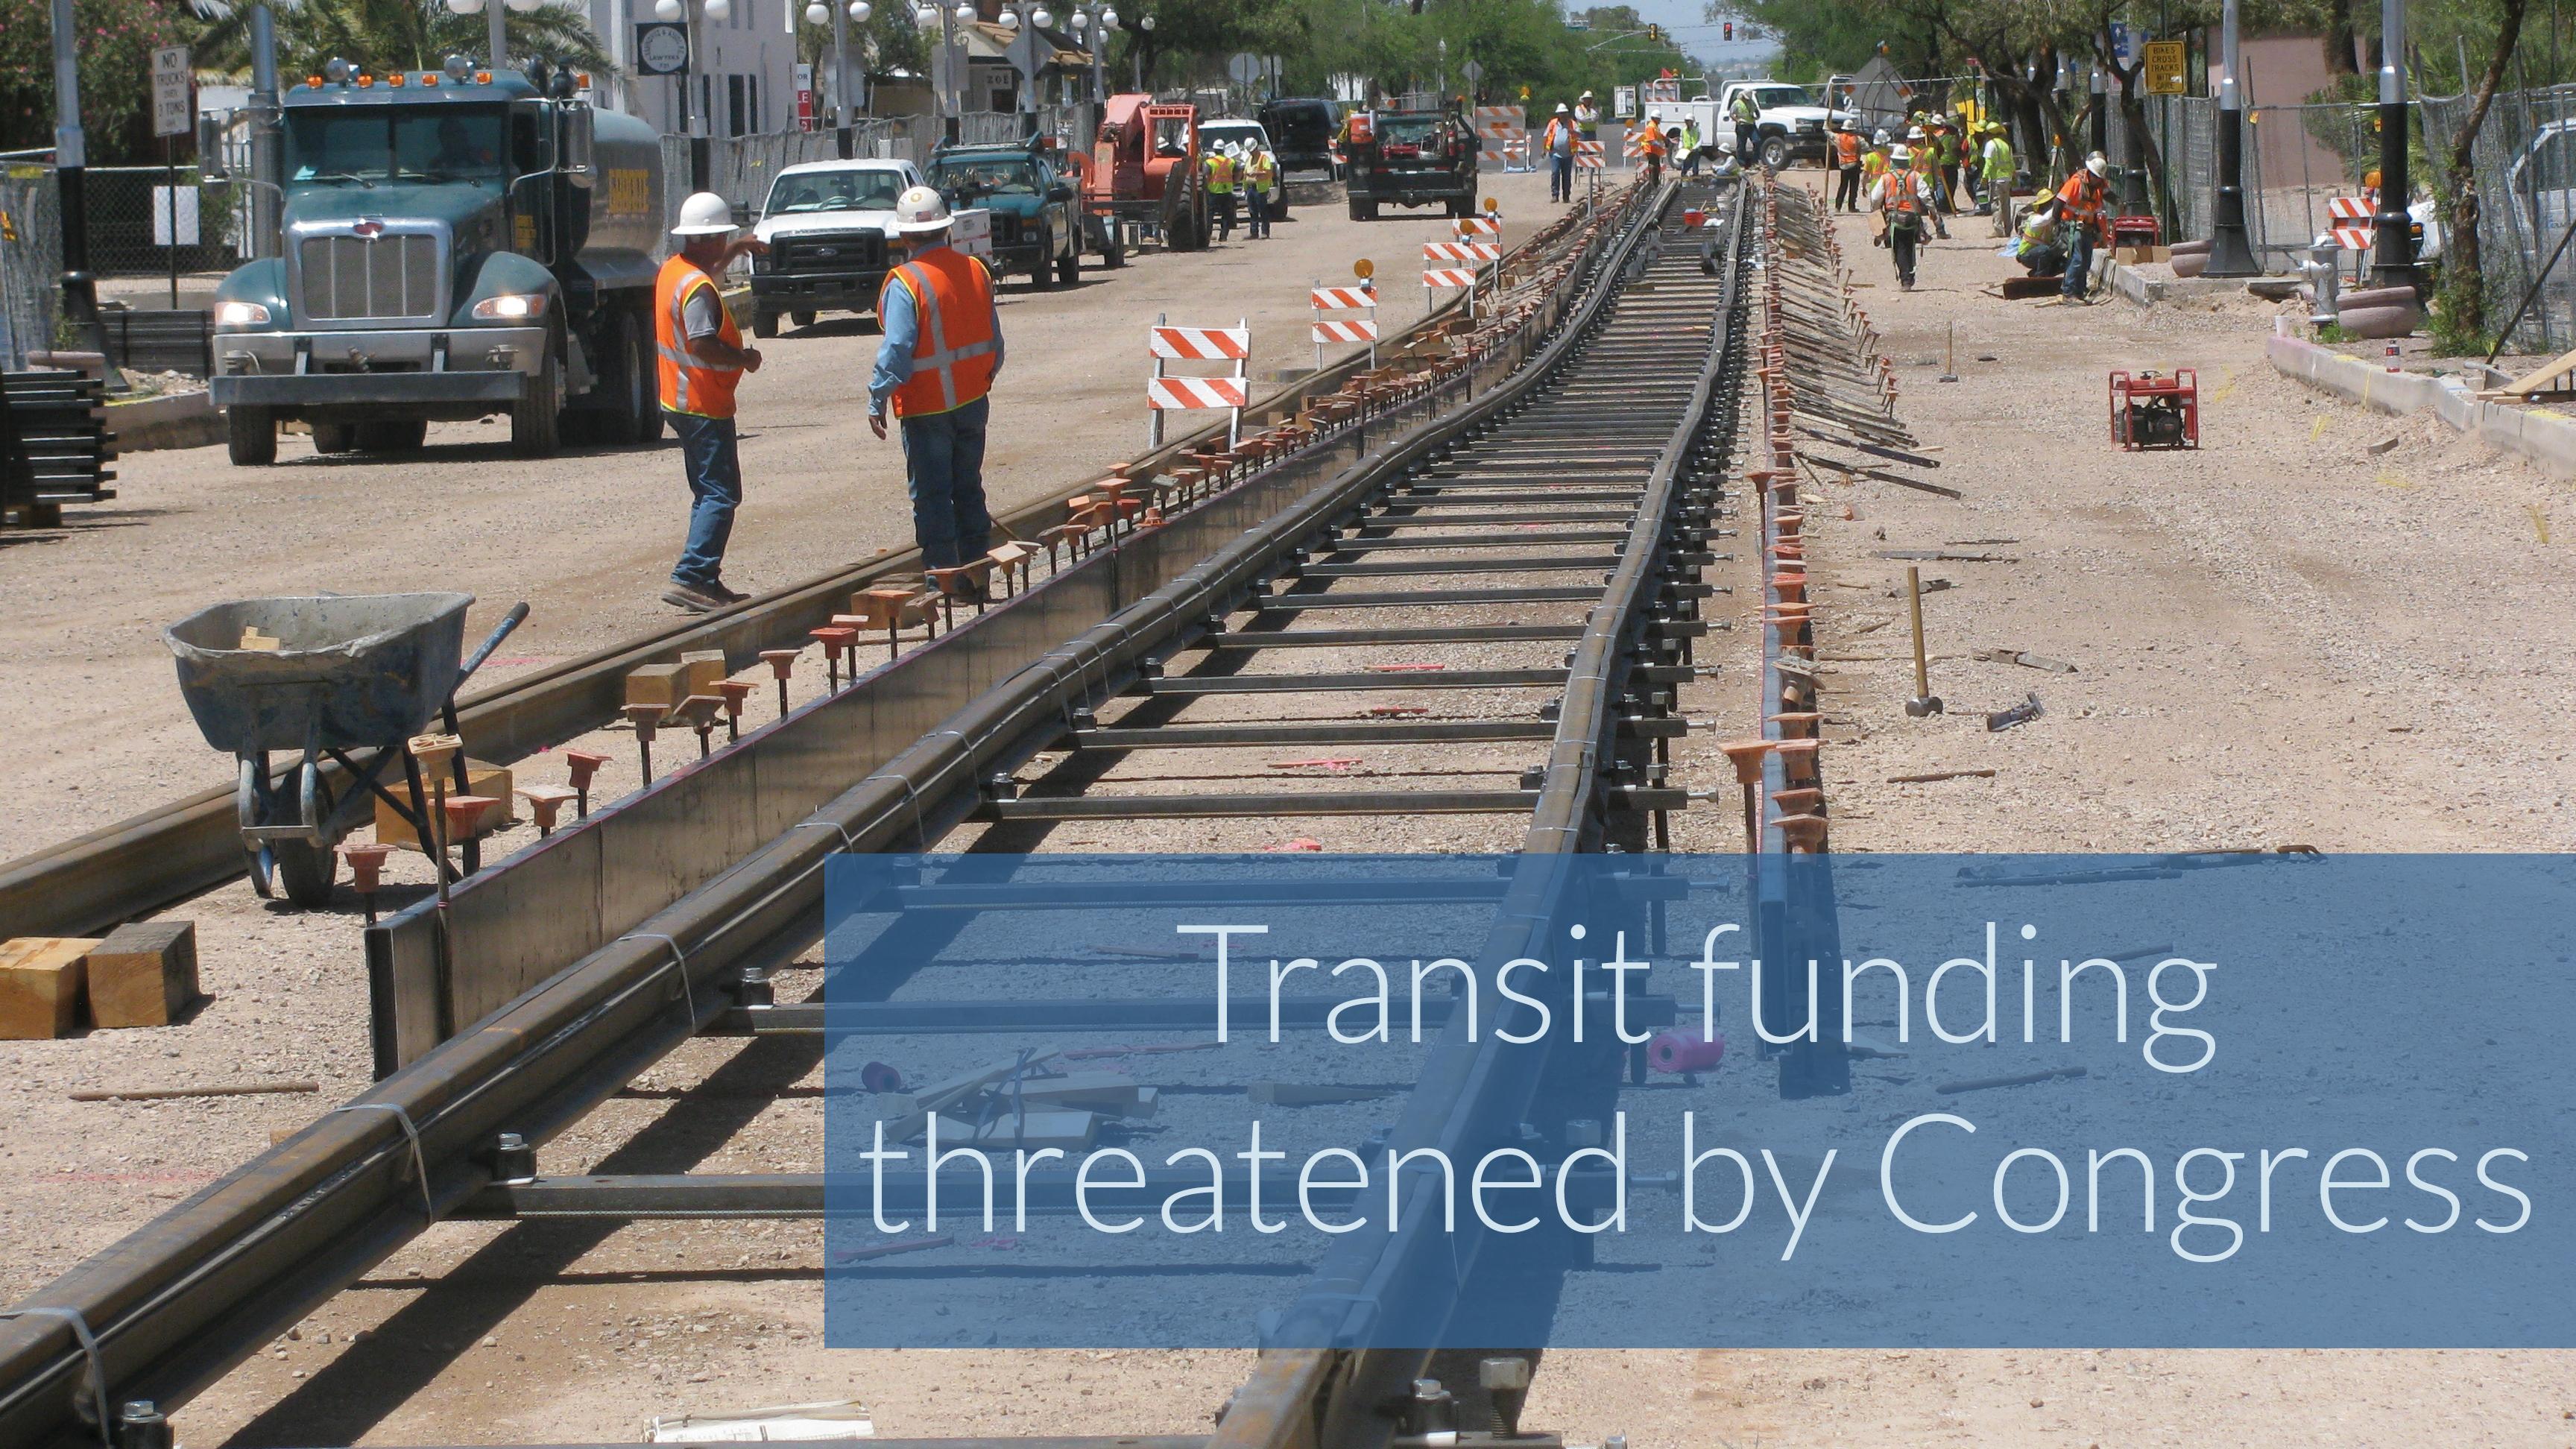 Federal transit funding threatened